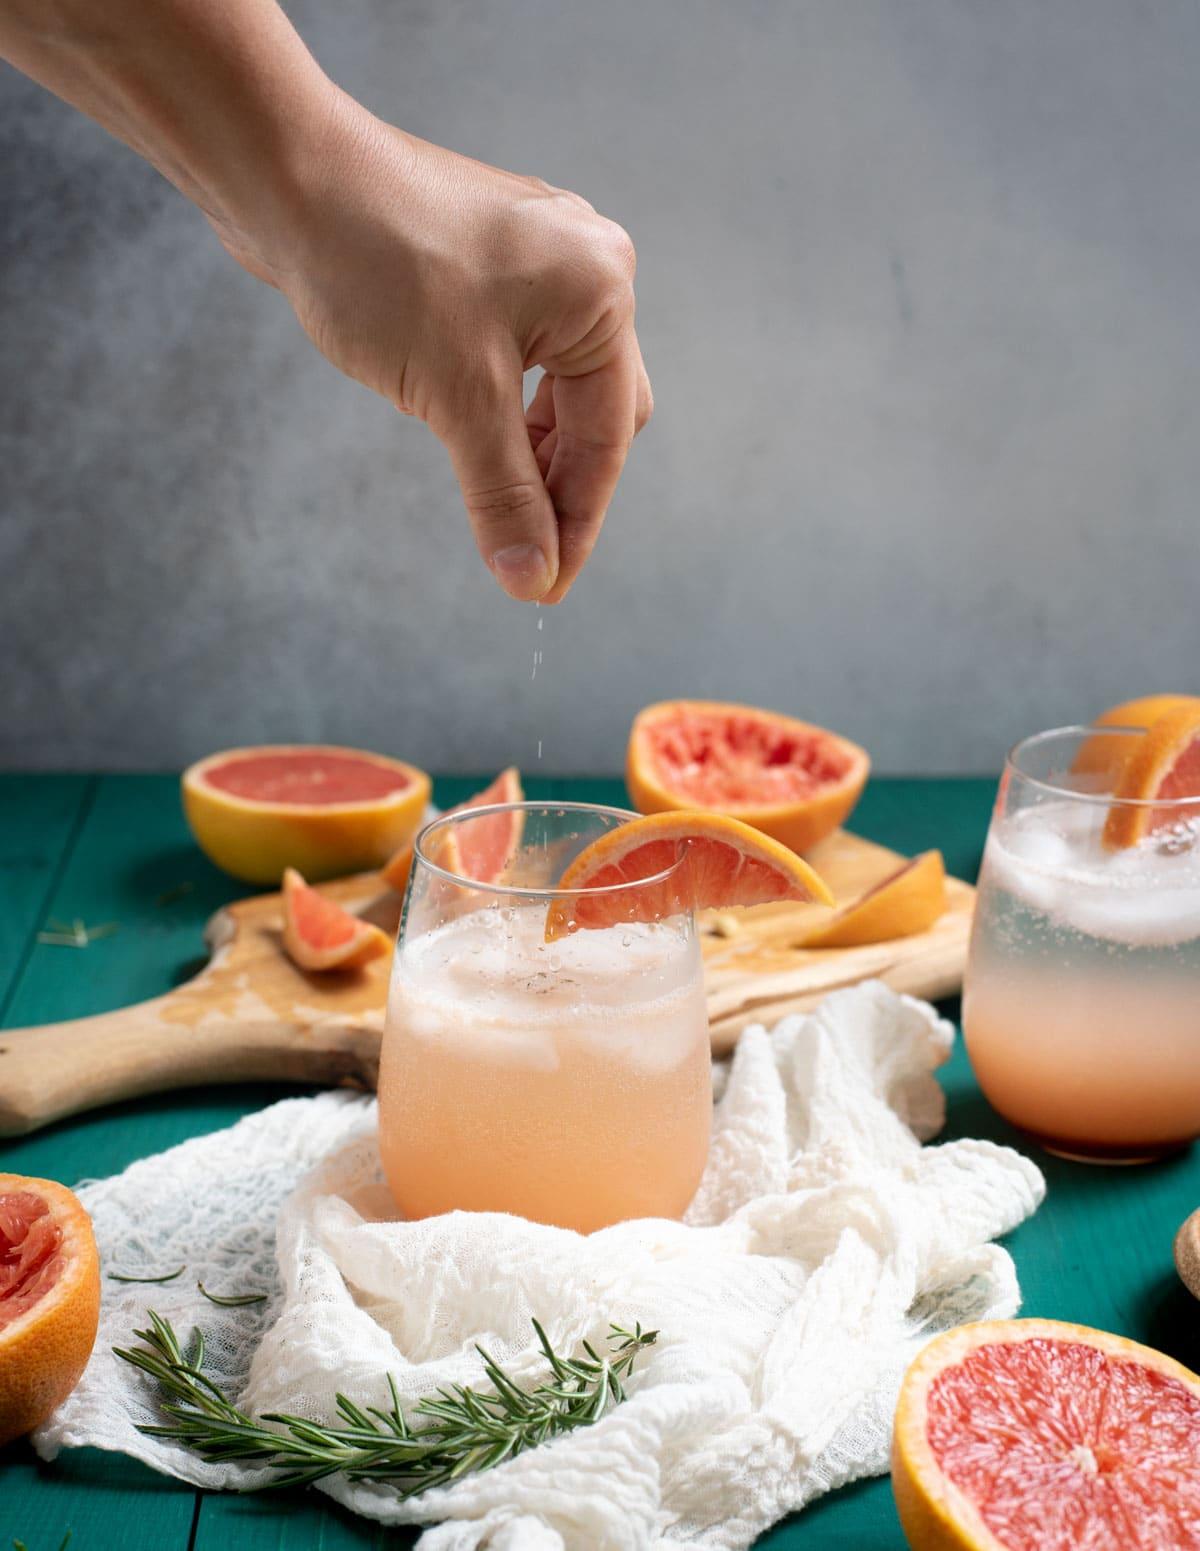 Hand sprinkling salt in Rosemary grapefruit mocktail